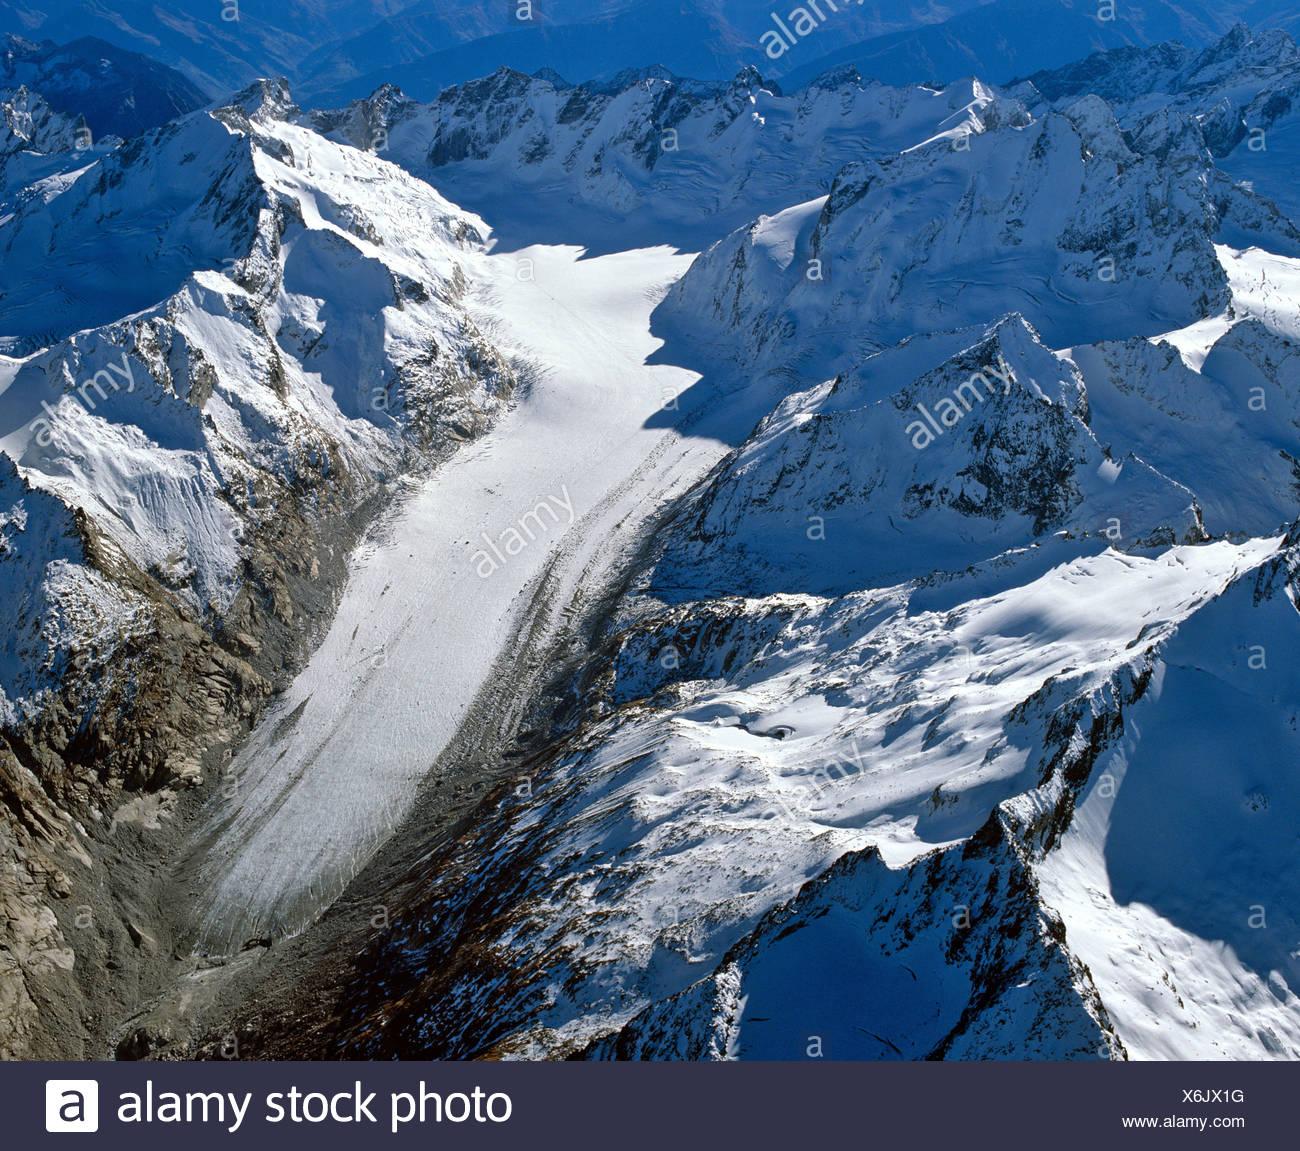 Aerial shot, Forno Glacier, Bergell, Grisons, Switzerland, Europe Stock Photo